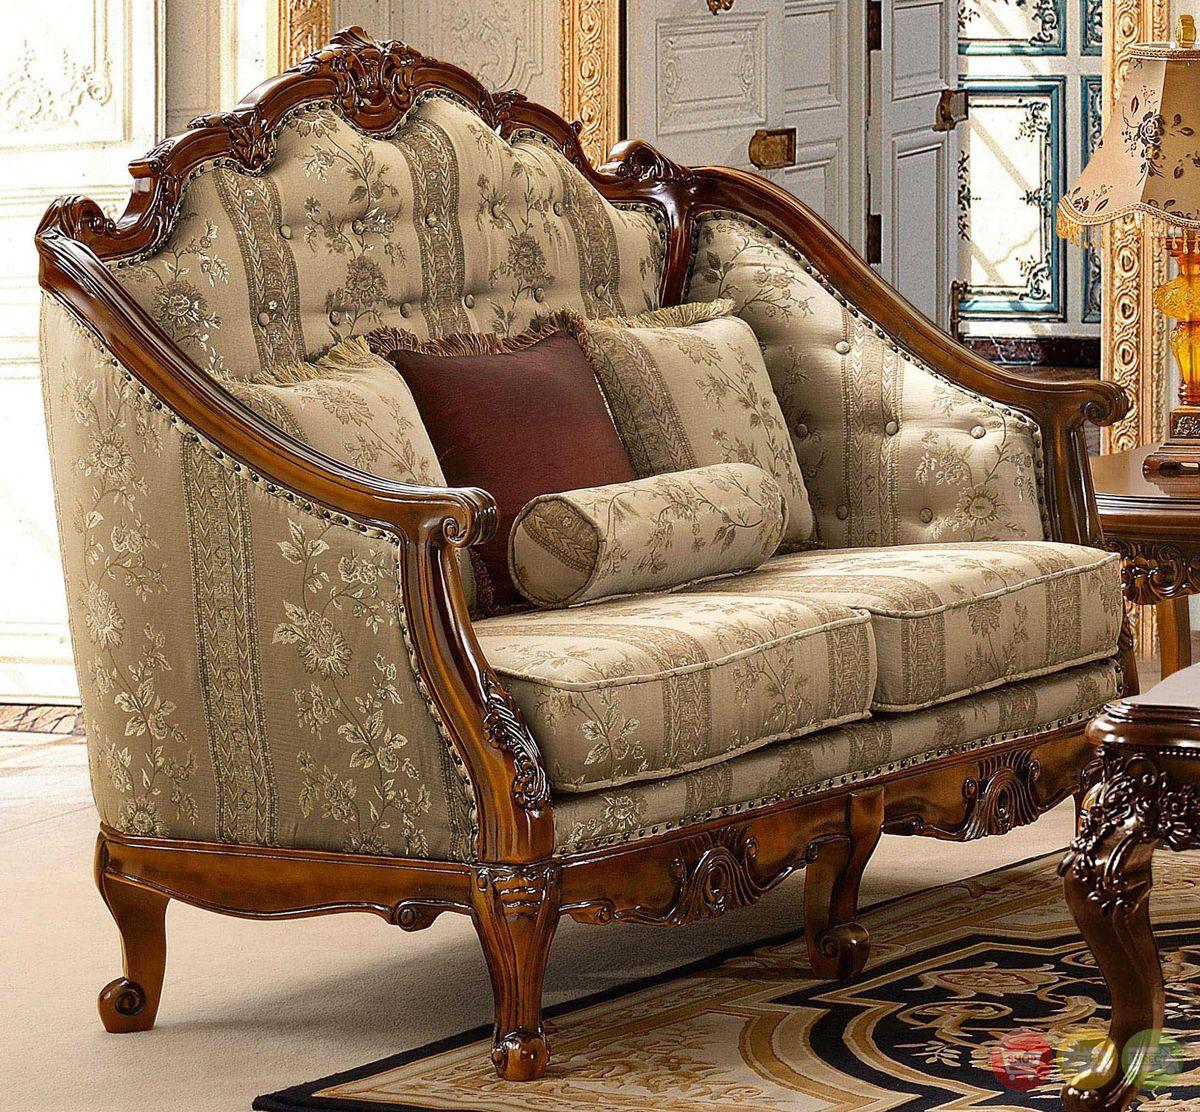 Living Room Chair Styles Stuhlede Com Victorian Living Room Furniture Antique Furniture Living Room Victorian Living Room